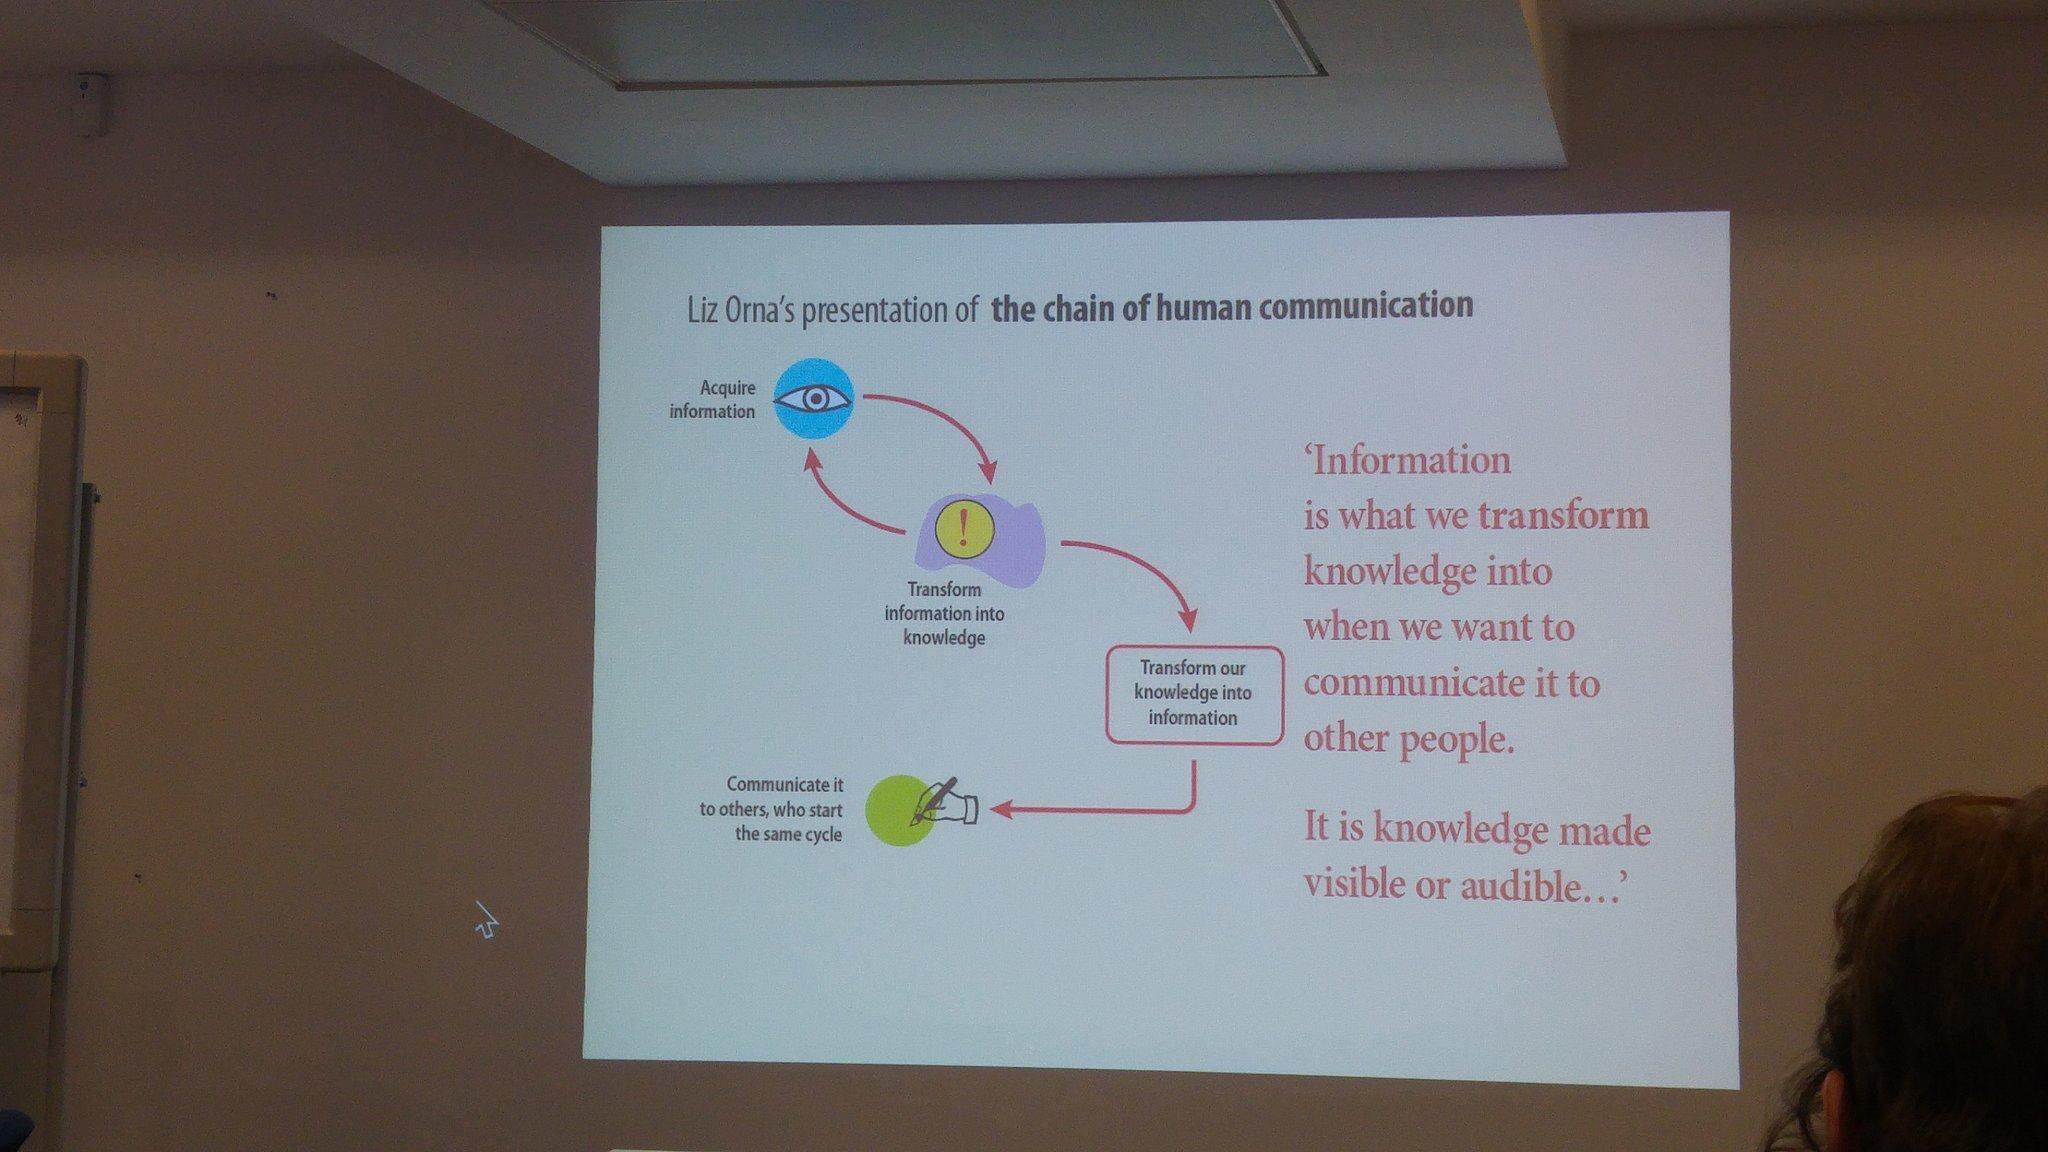 Liz Orna's concept of the information product /chain of human communication  #infodesign #netikx83 https://t.co/6Wq7zEhxub